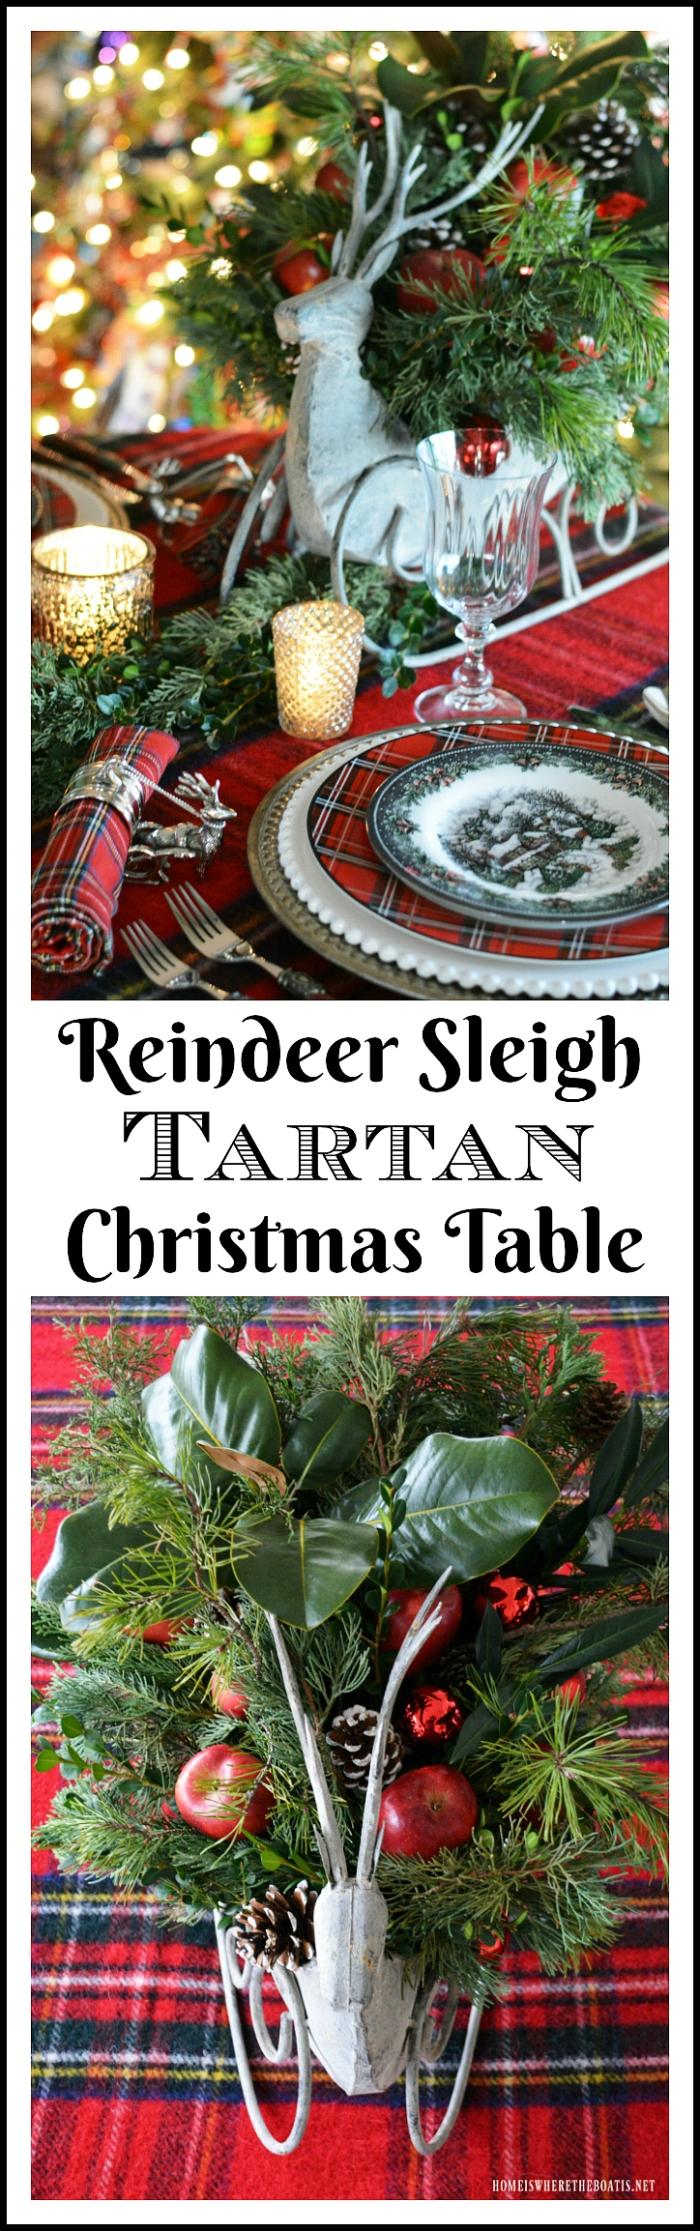 Reindeer Sleigh Tartan Christmas Table and Centerpiece | homeiswheretheboatis.net #Christmas #tablescapes #tartan #plaid